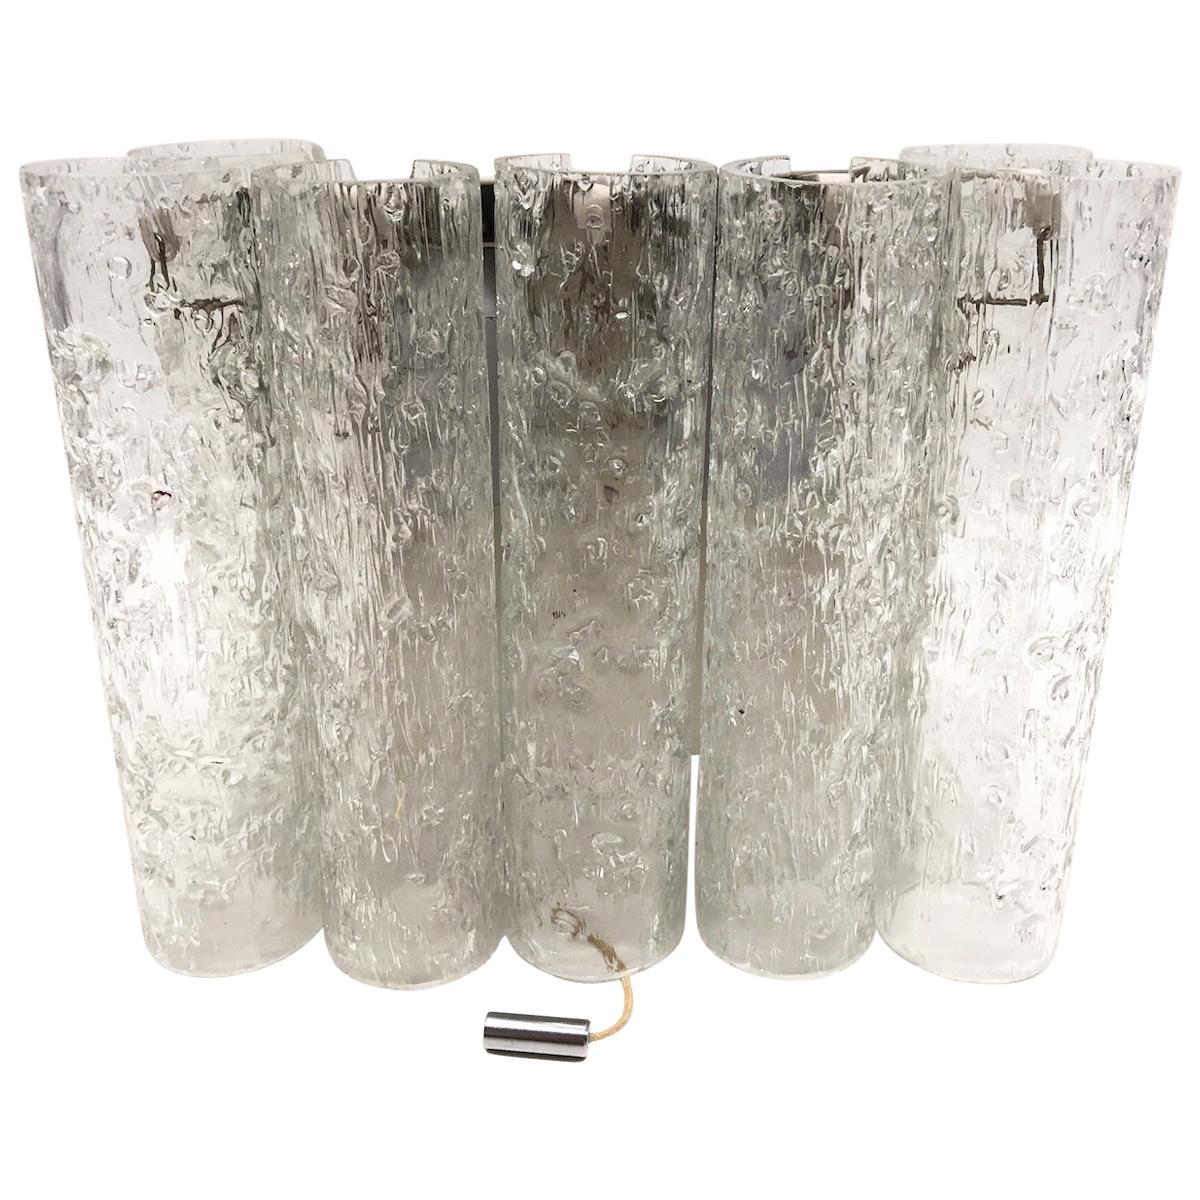 Chic Petite 1960s German Doria Leuchten Glass Tubes Sconce